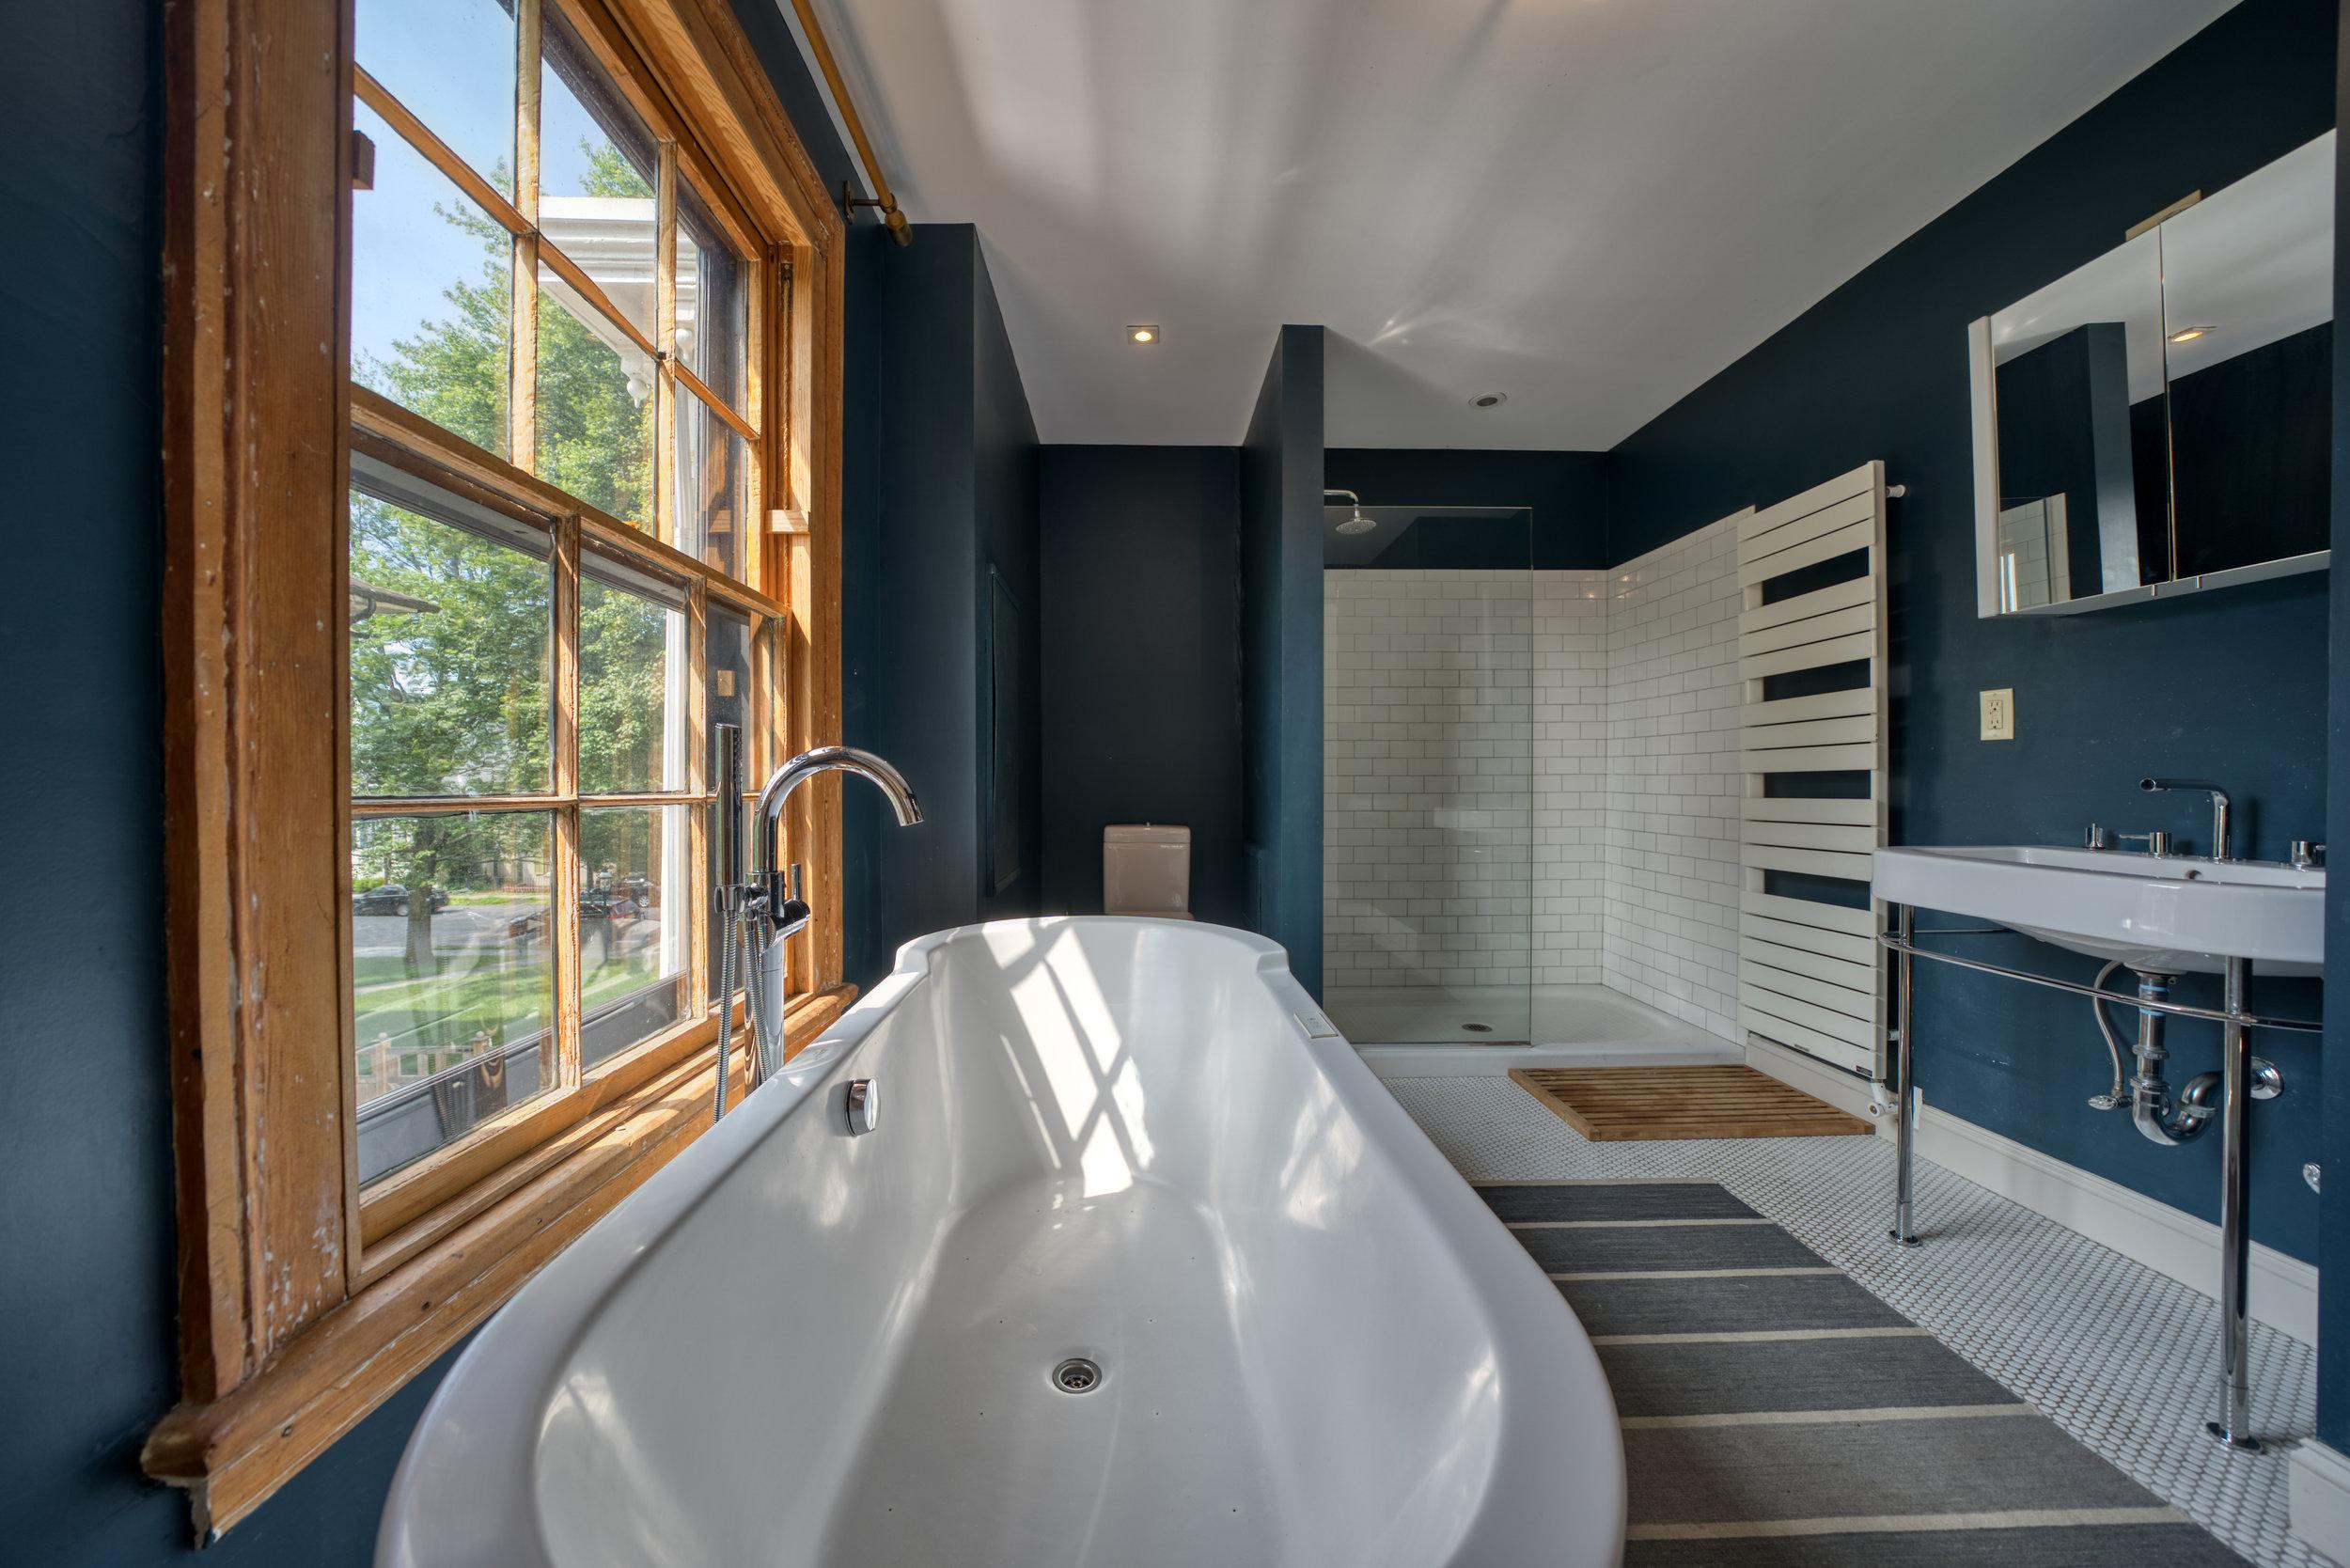 UptownKingston-Master-Bathroom-1.jpg